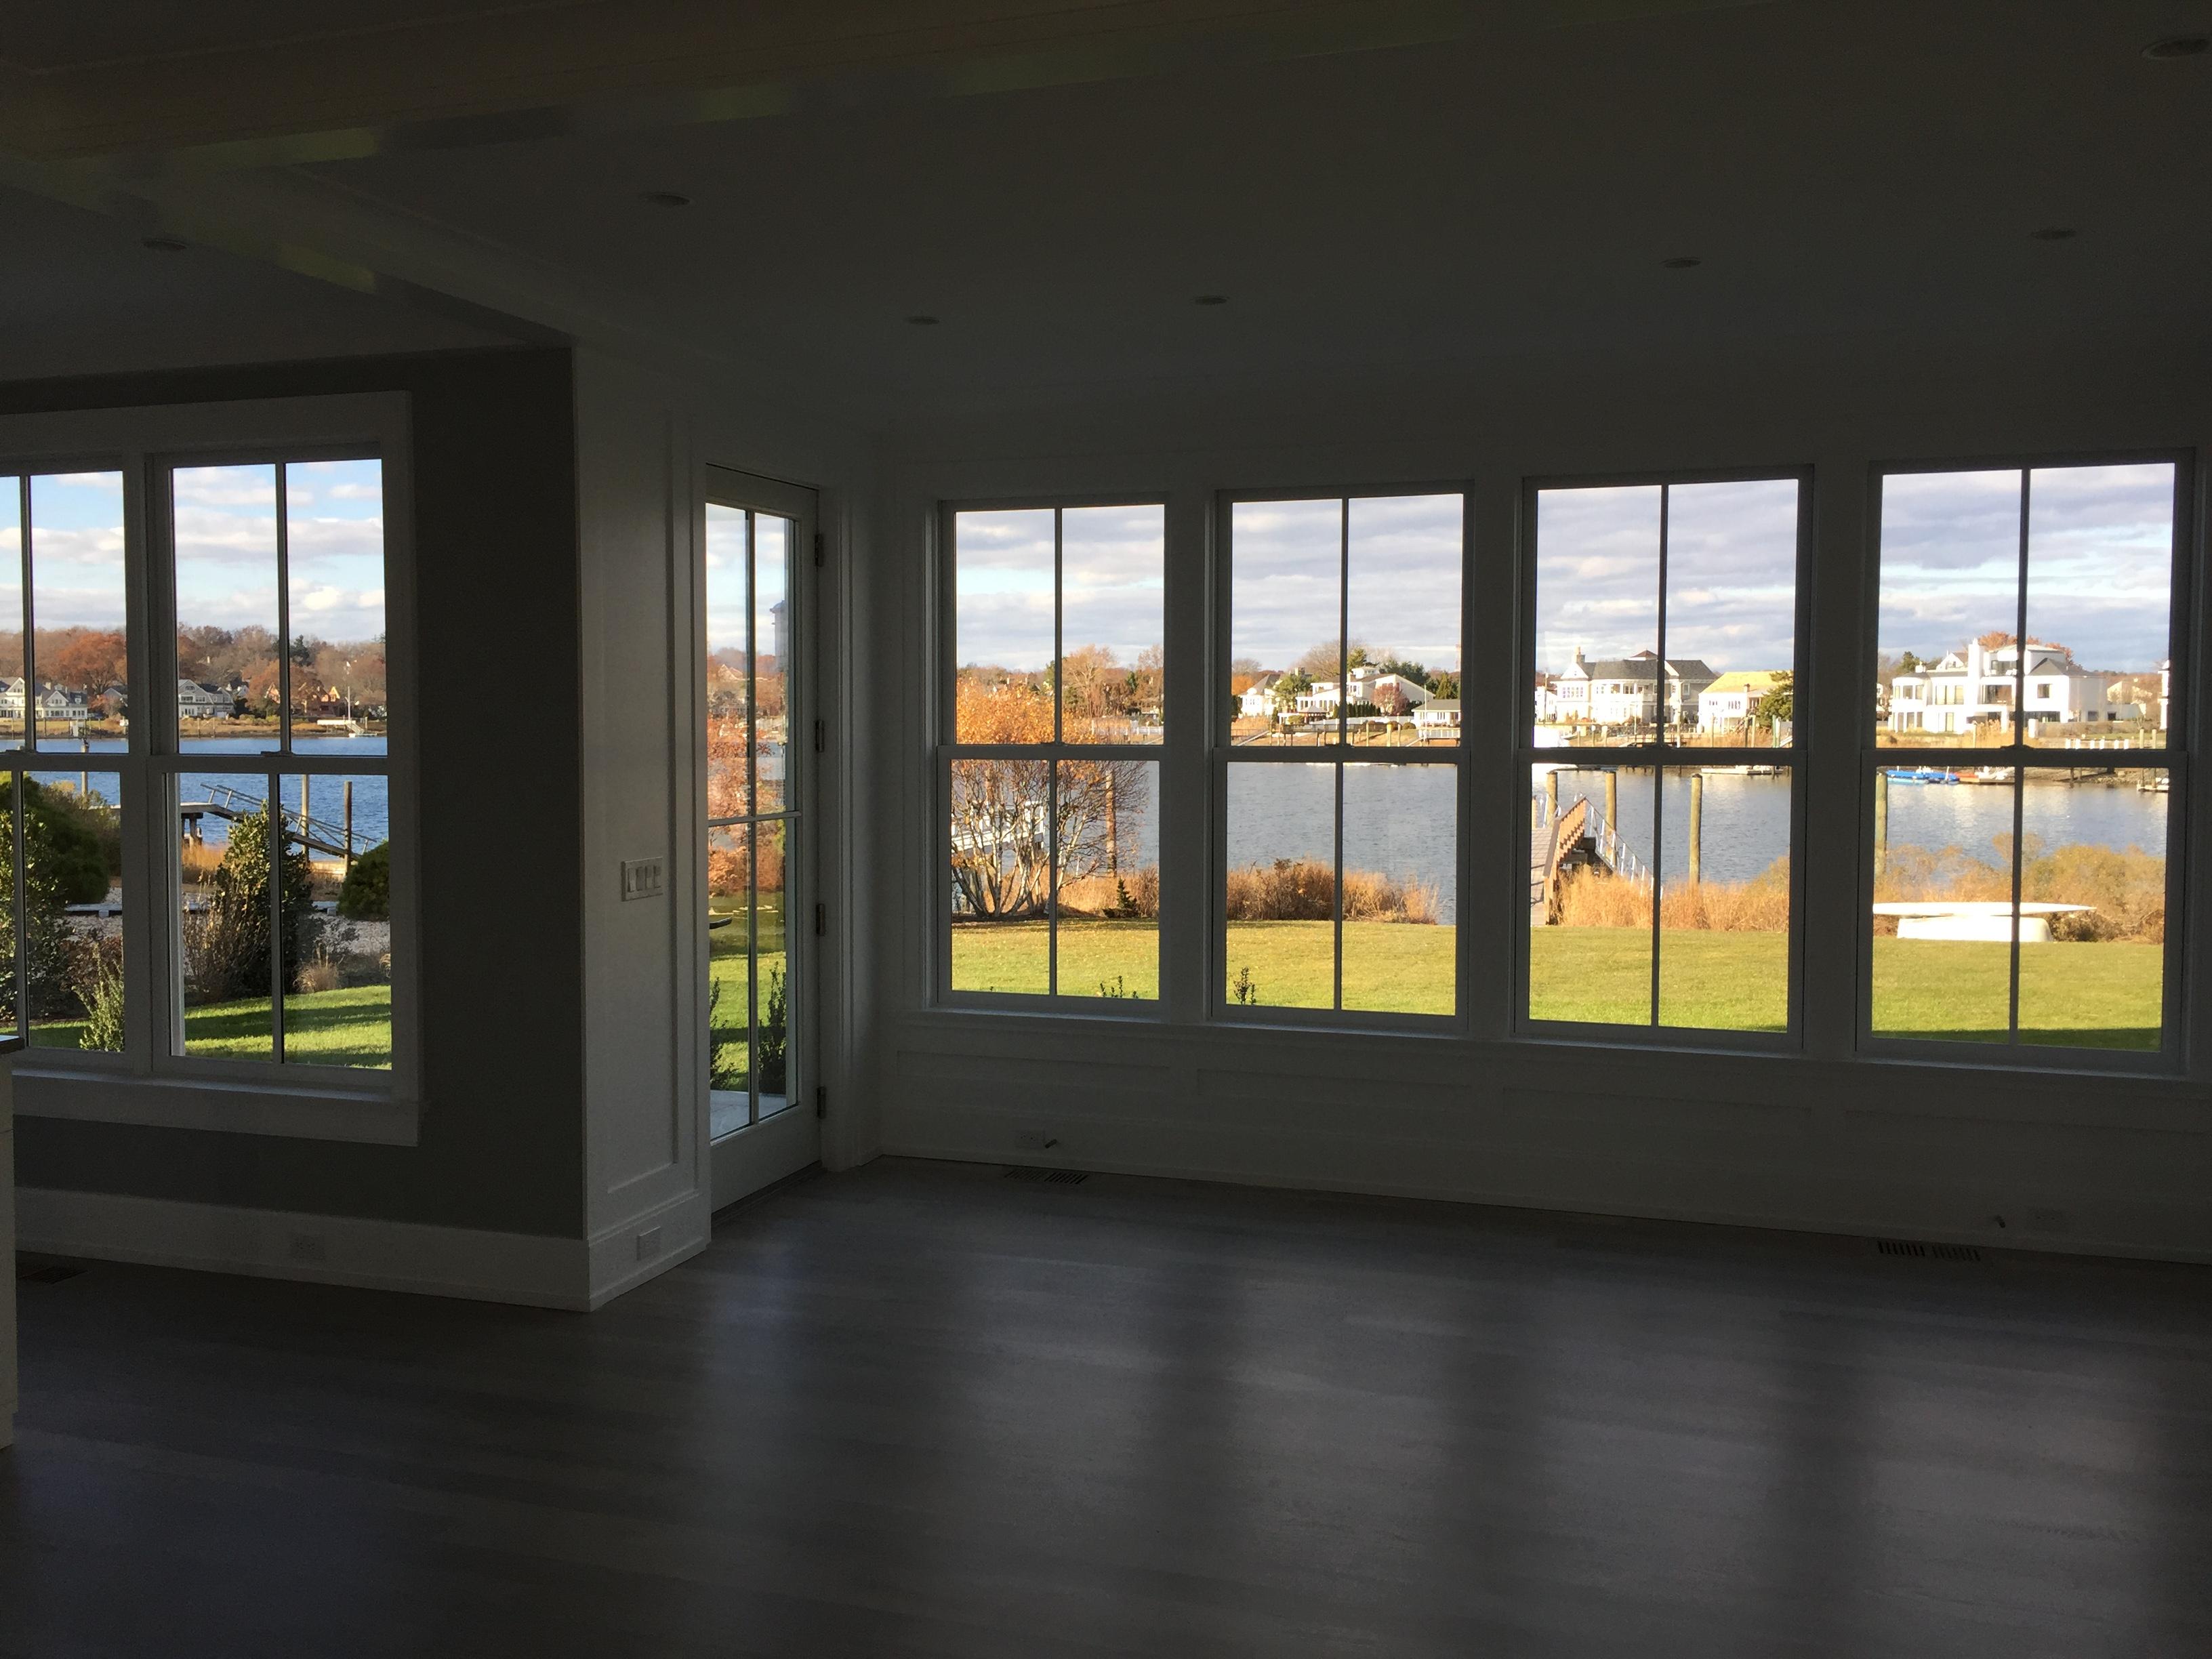 Beach House: Westport, Ct